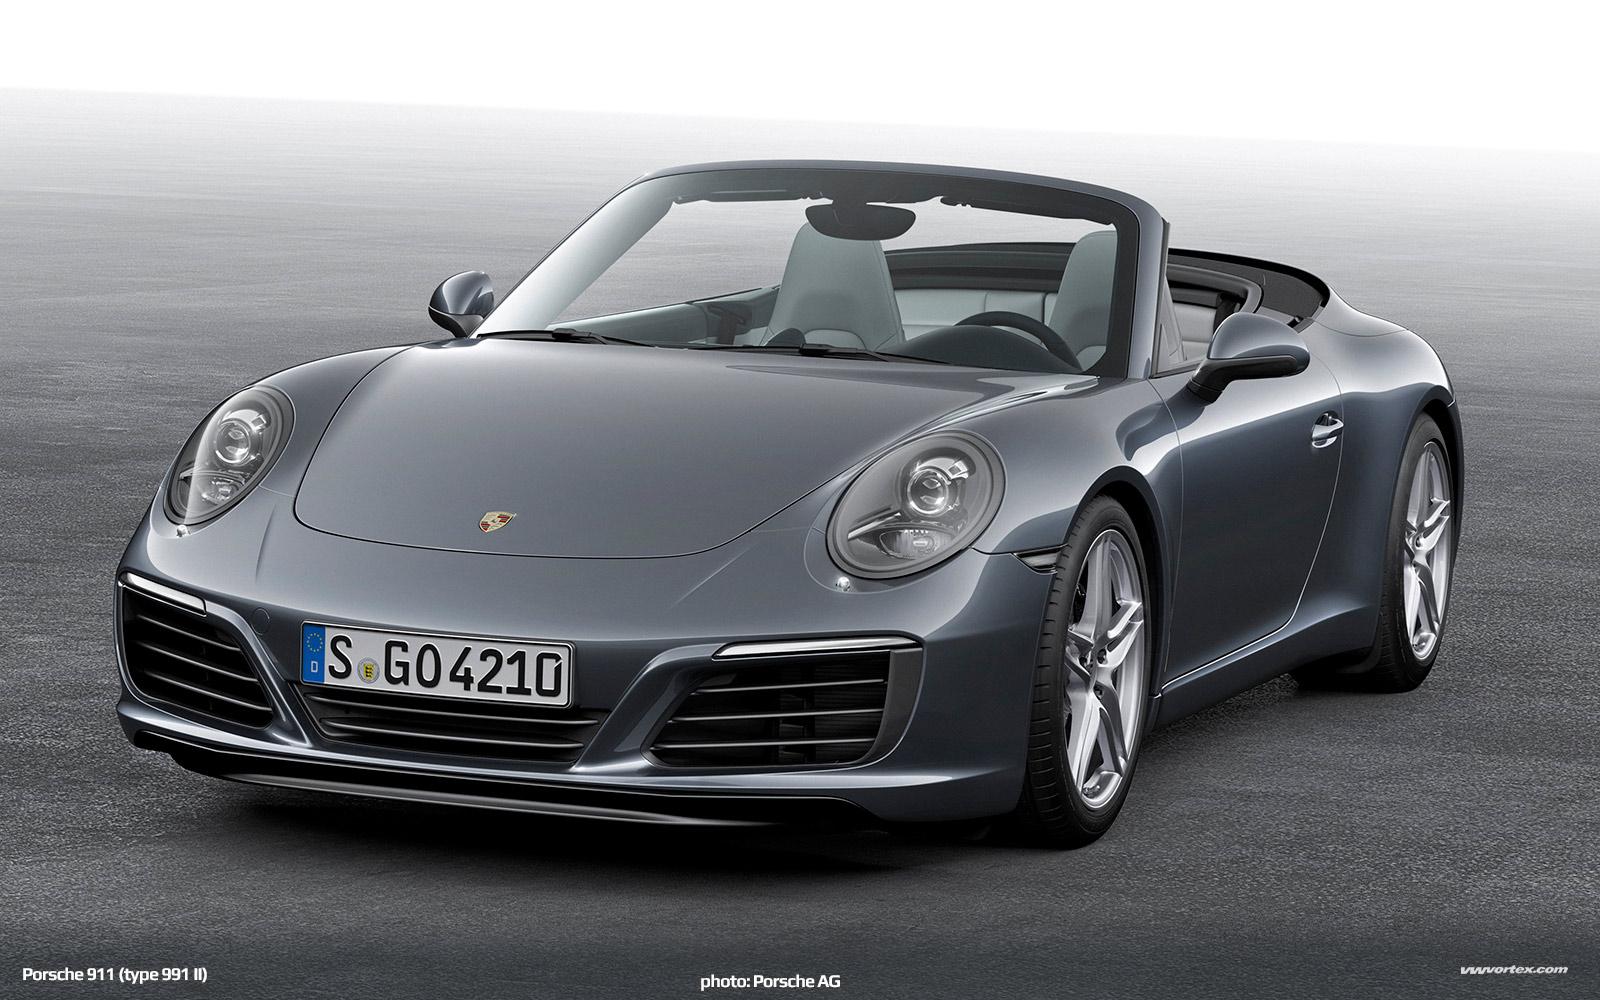 Porsche-911-991-ii-2016-502